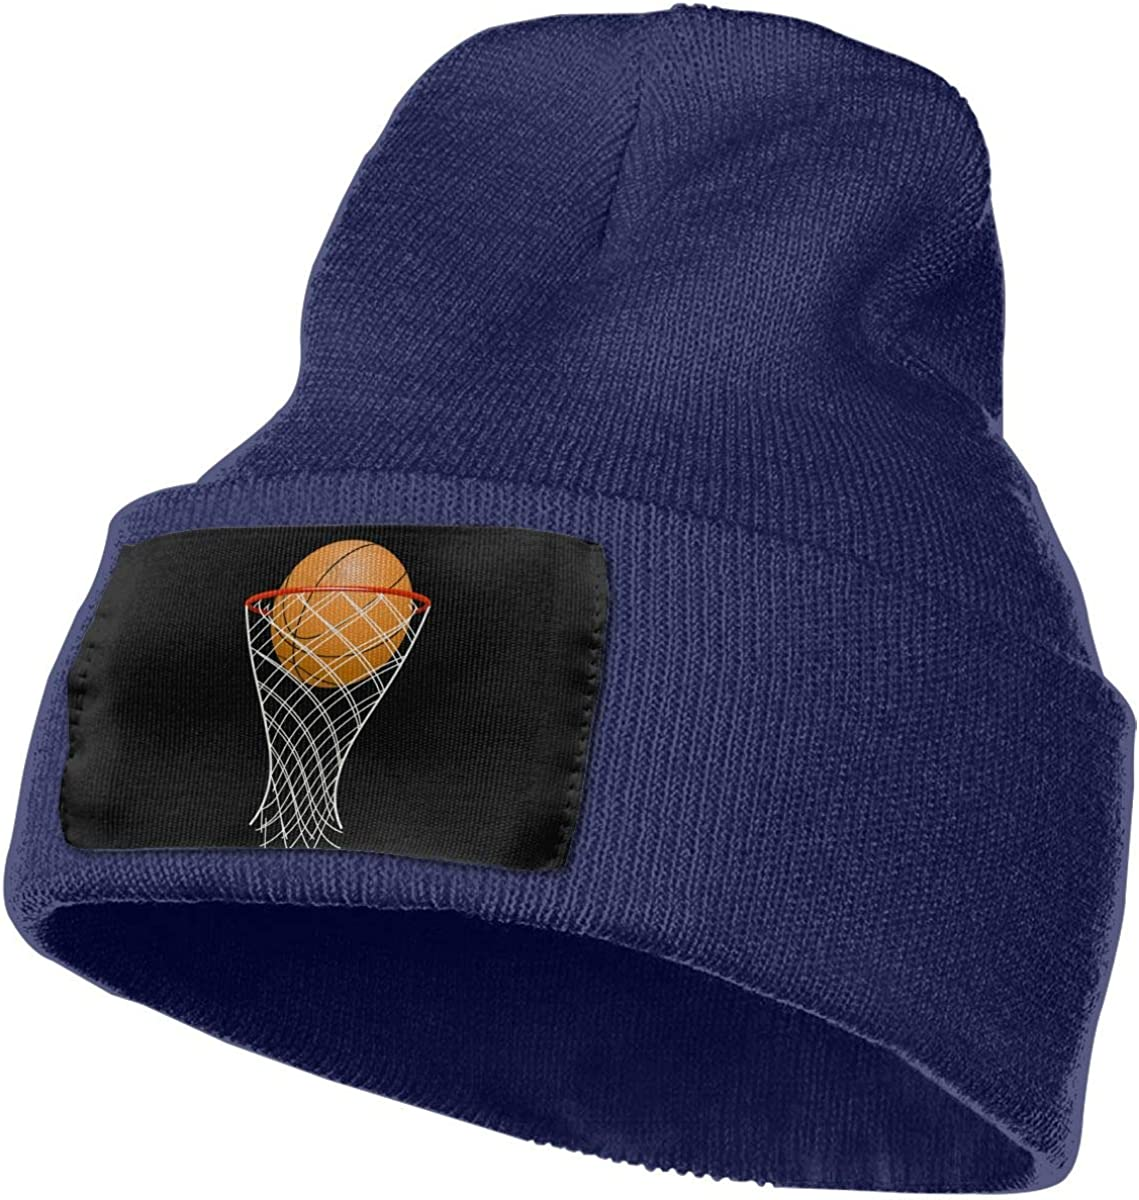 SLADDD1 Basketball and Hoop Warm Winter Hat Knit Beanie Skull Cap Cuff Beanie Hat Winter Hats for Men /& Women